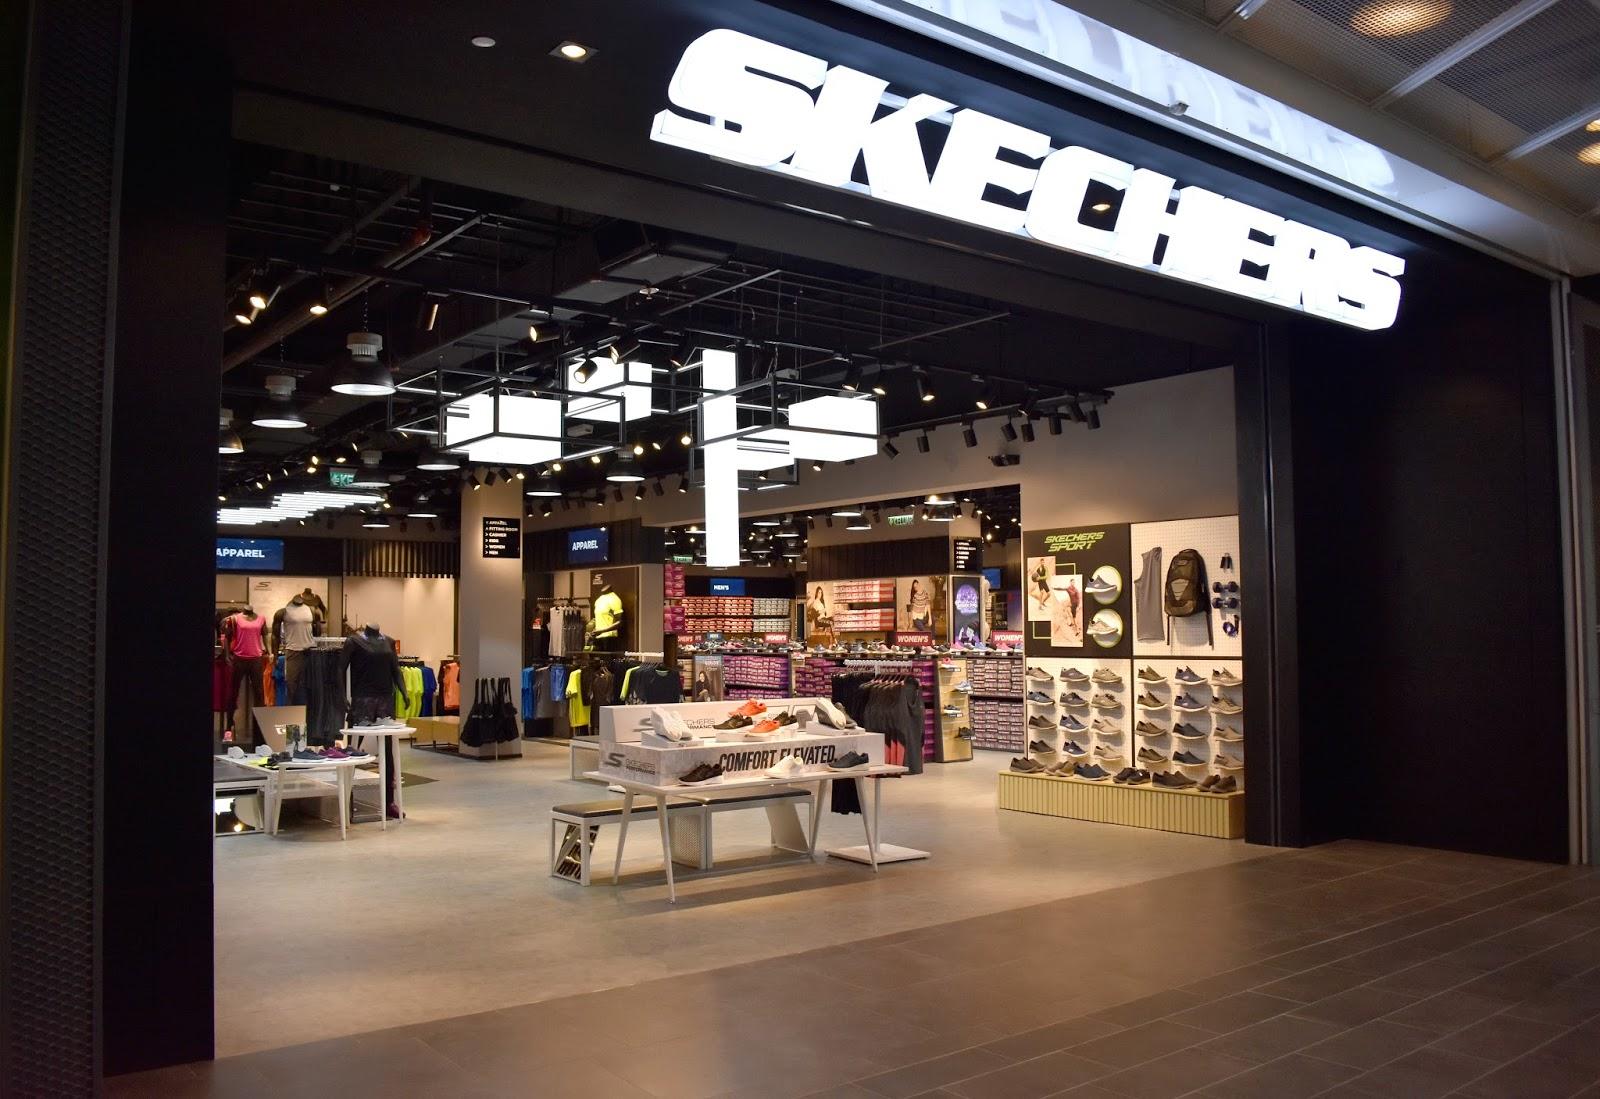 Economía llave inglesa Benigno  Malaysian Lifestyle Blog: Skechers City Outlet Opens at IPC Shopping Centre